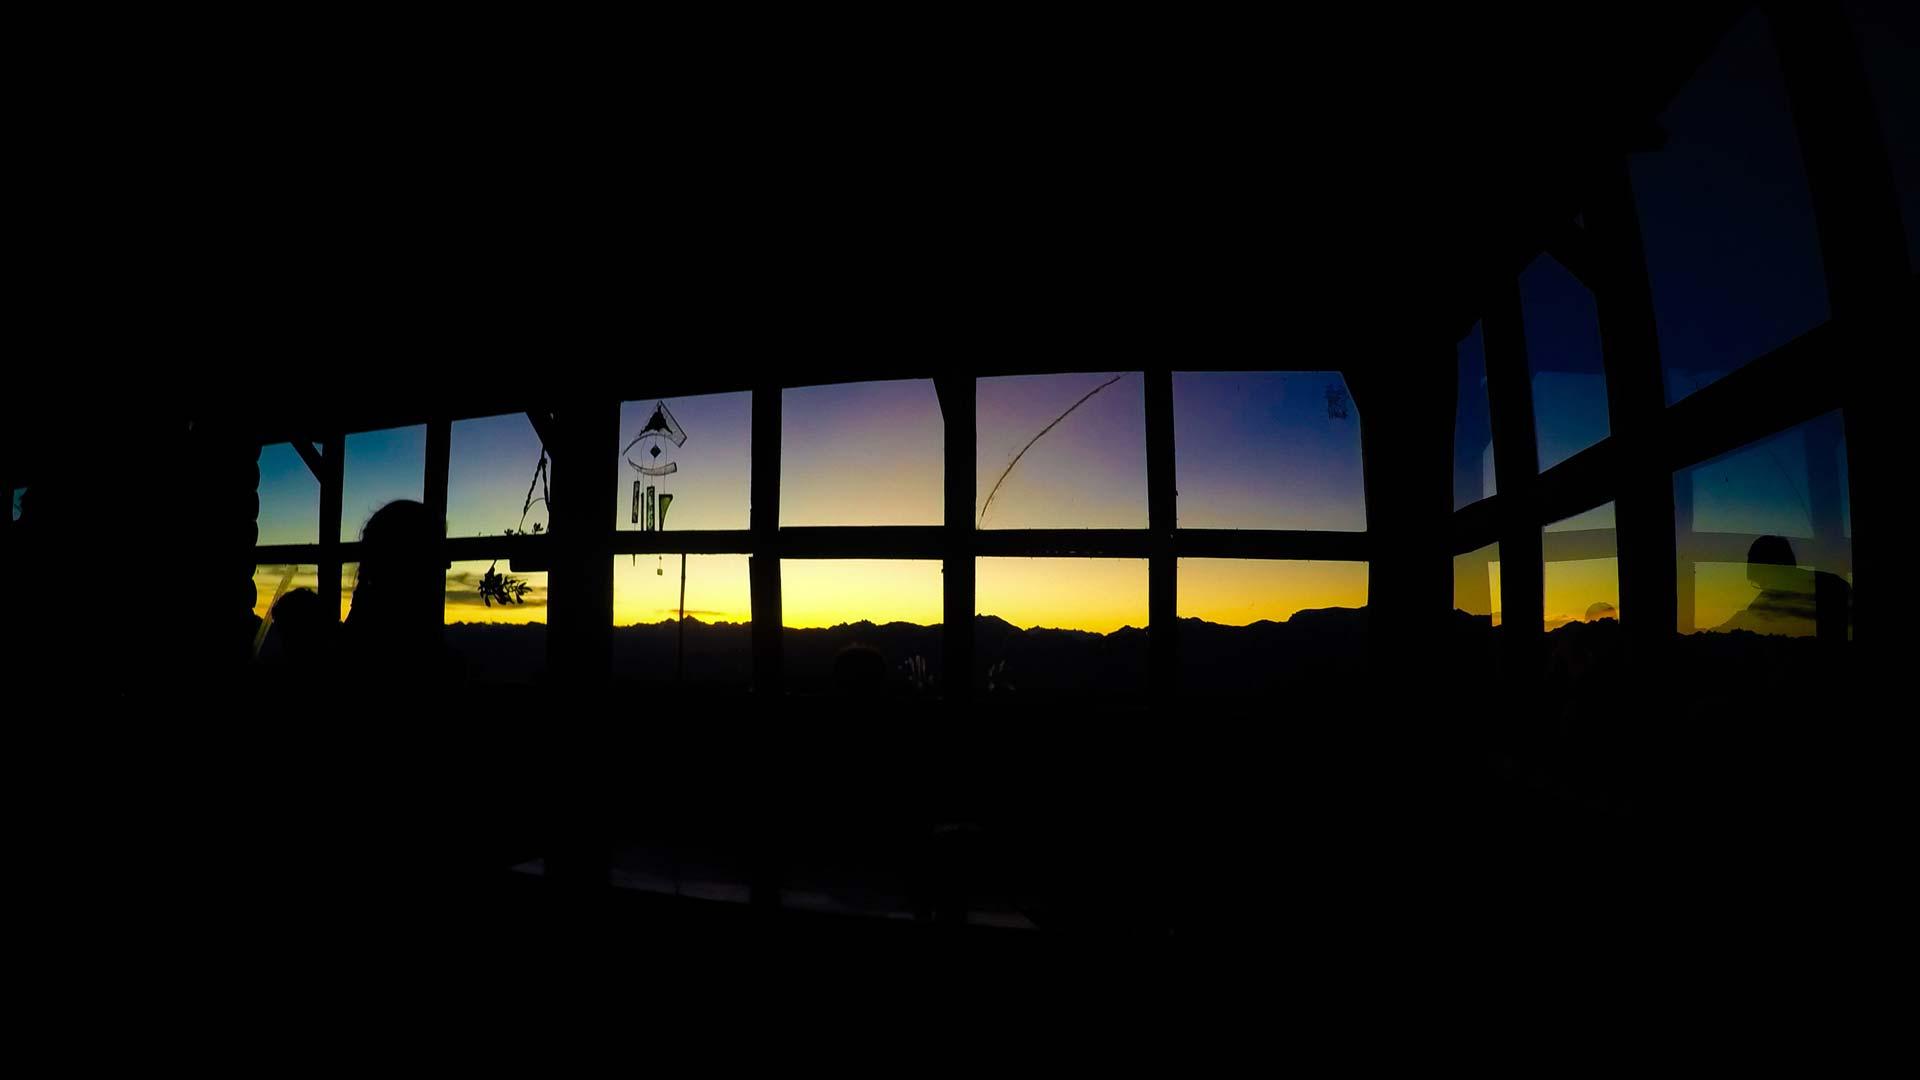 Sunset inside the mountain refuge